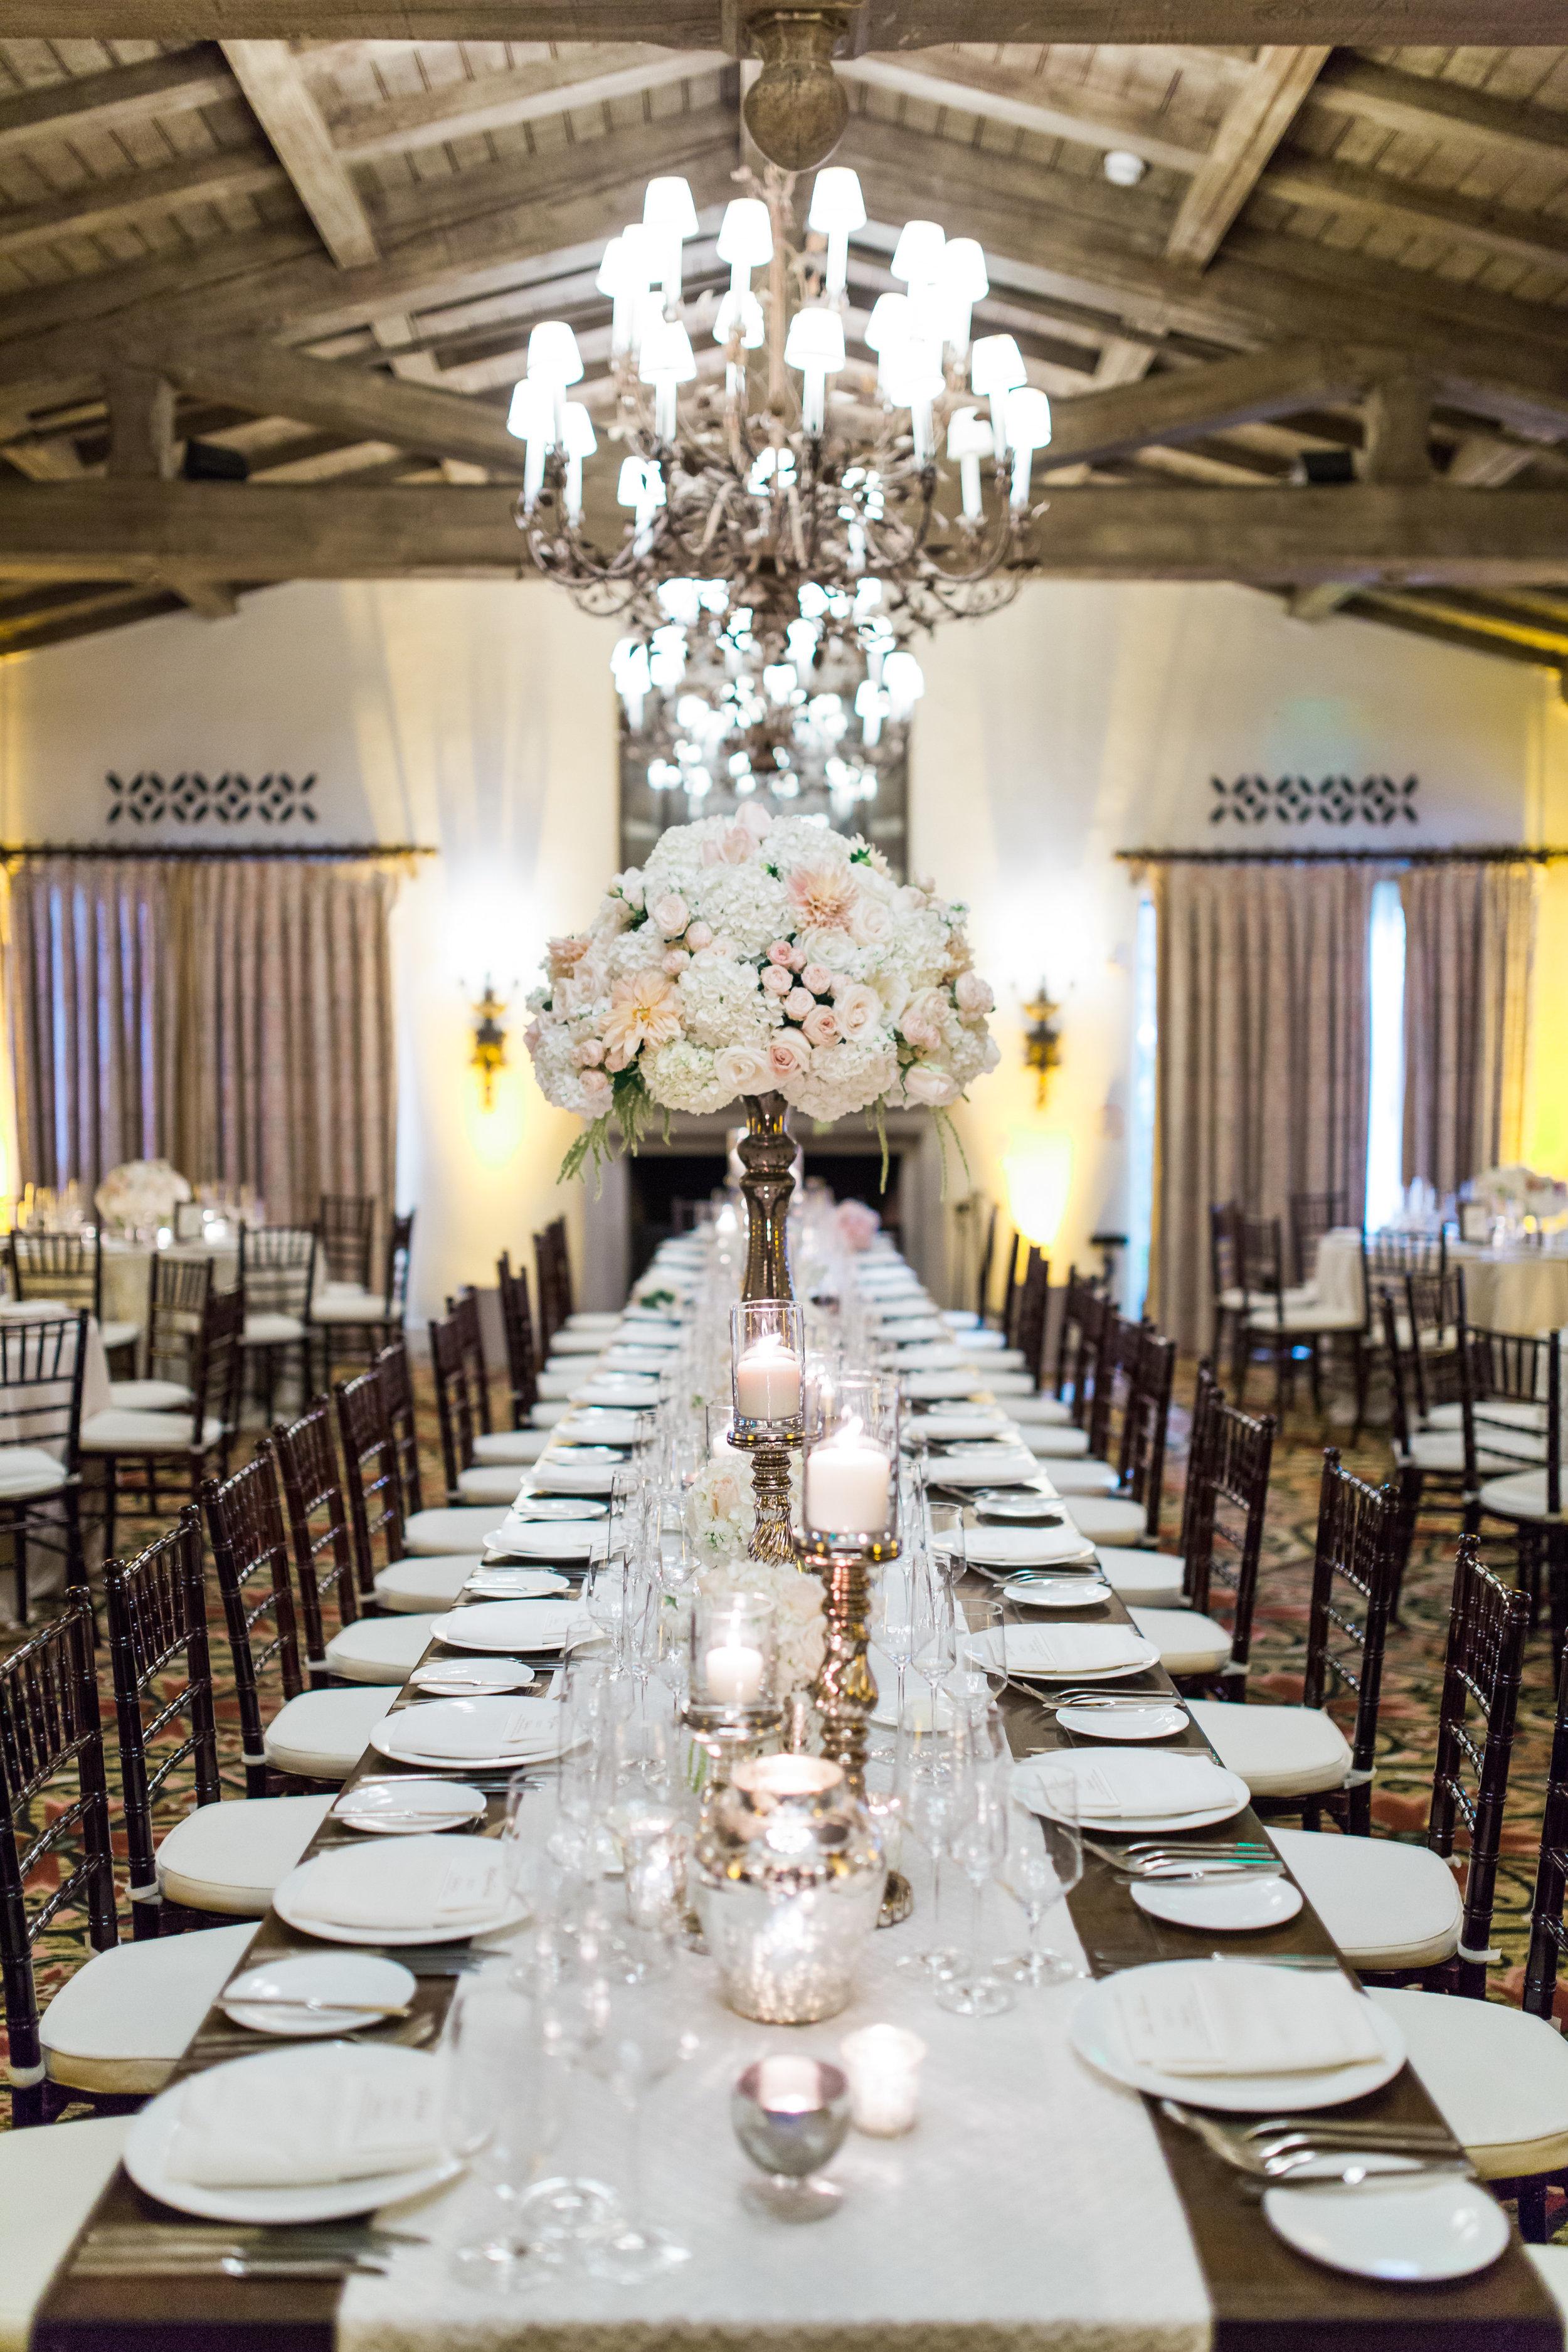 santabarbarawedding.com   Photographer: Kiel Rucker Photography   Santa Barbara Four Seasons Biltmore   Wedding Venue